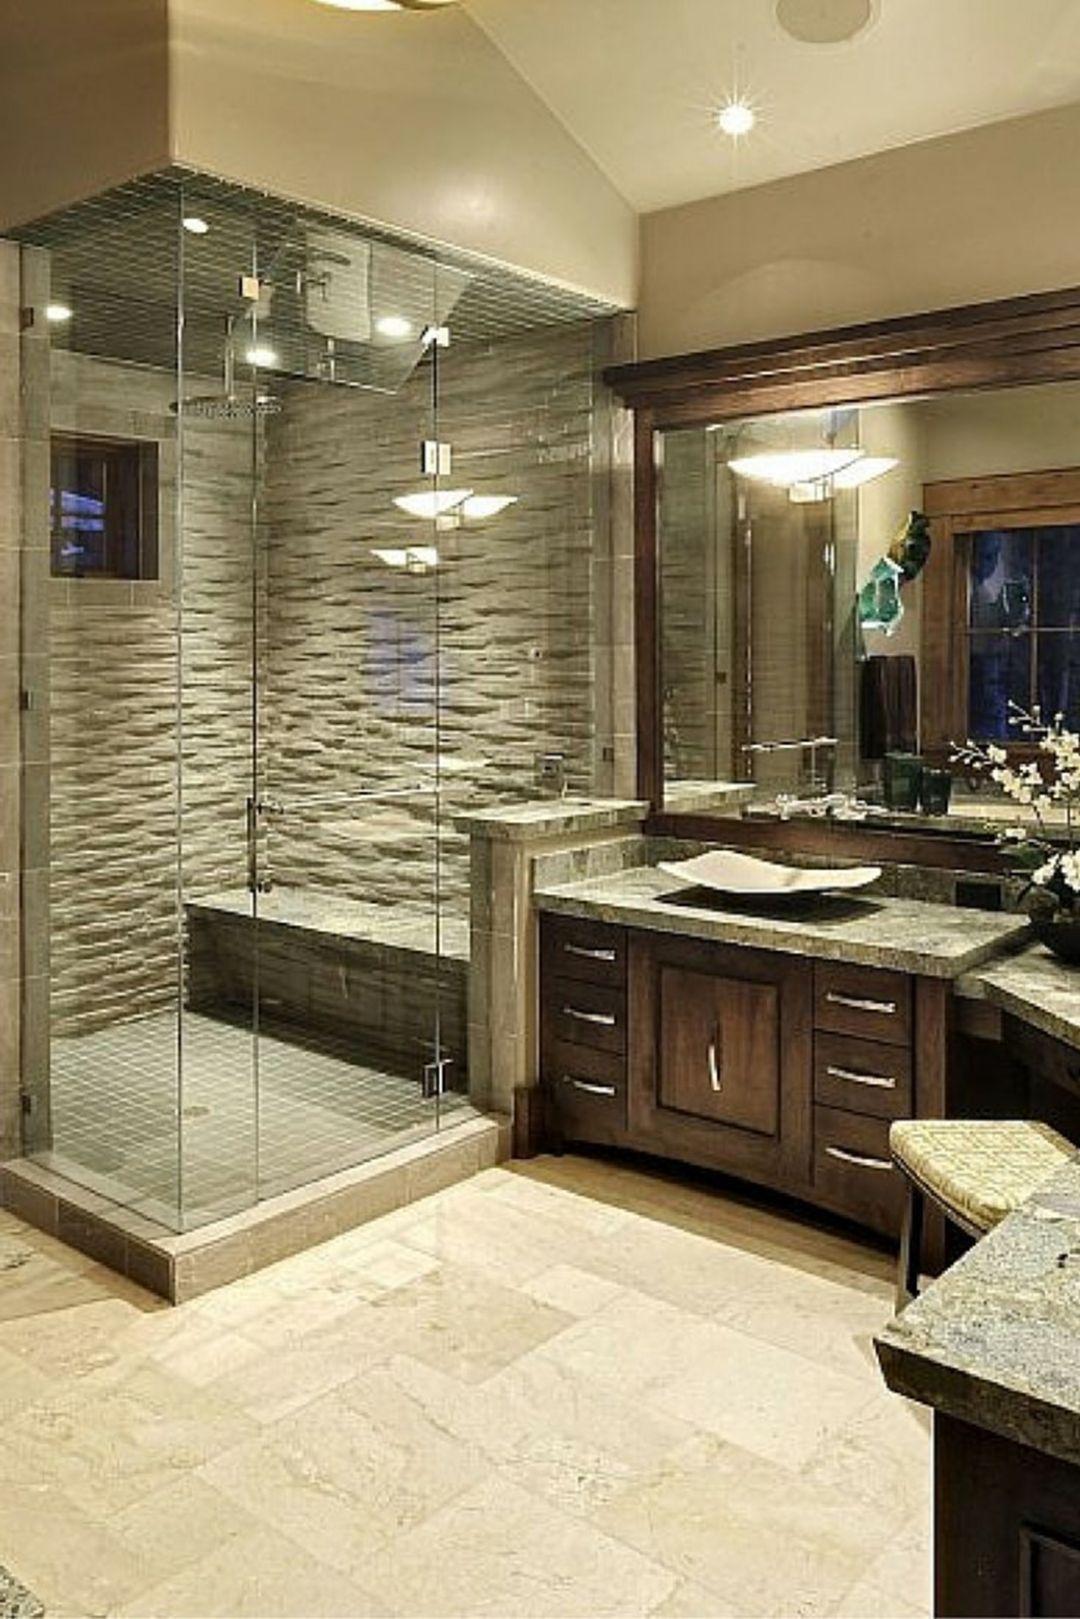 30 Cool Bathroom Shower Design Ideas | Bathroom remodel ...